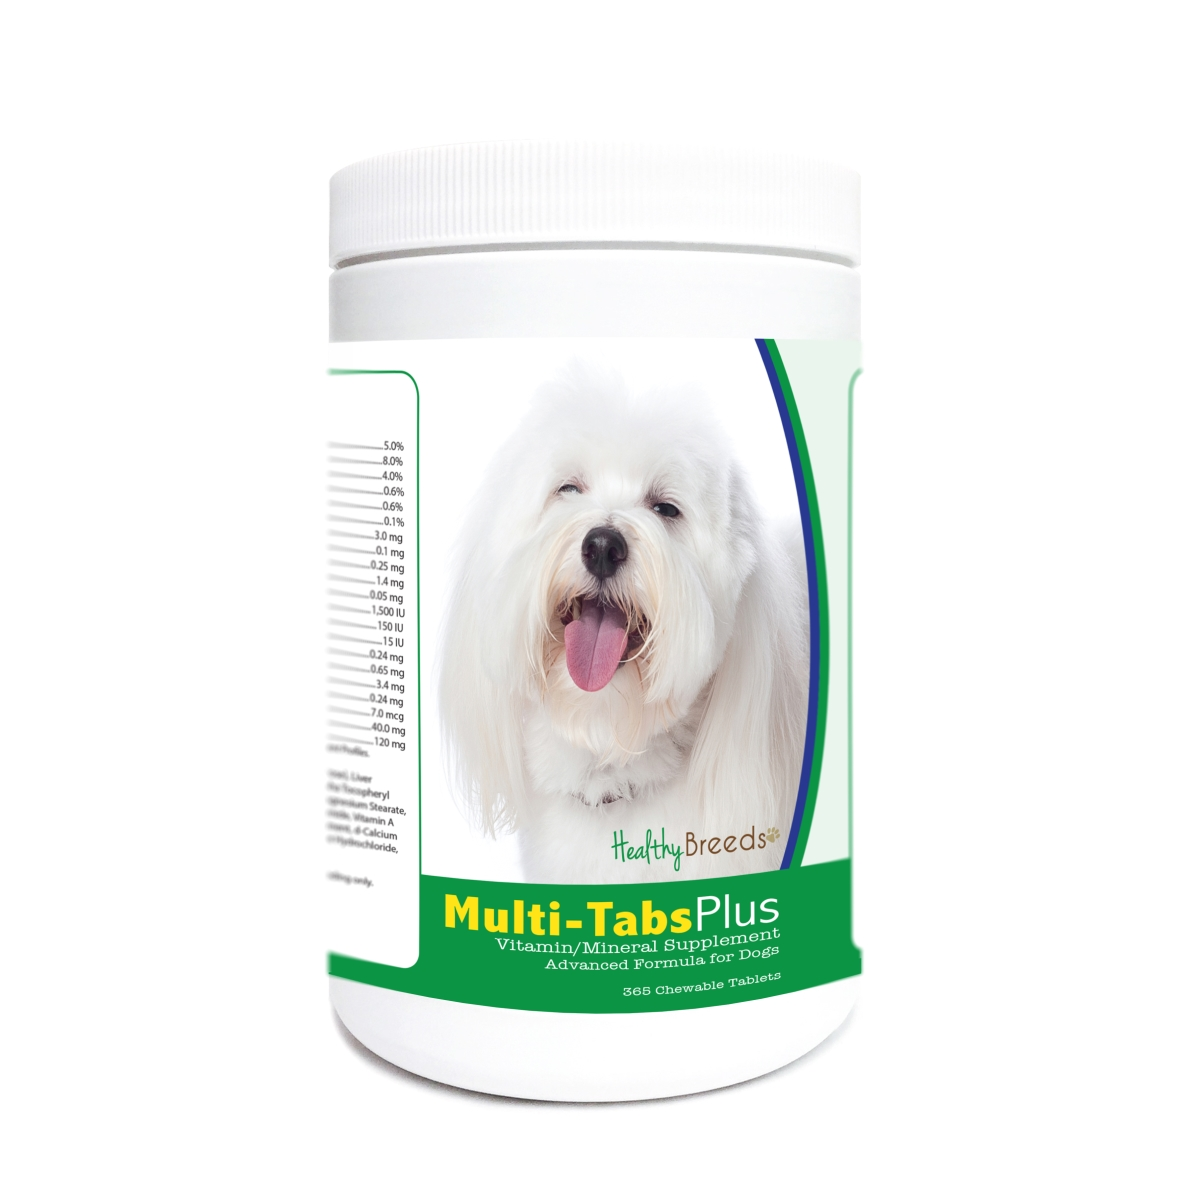 Healthy Breeds 840235176664 Coton de Tulear Multi-Tabs Plus Chewable Tablets - 365 Count